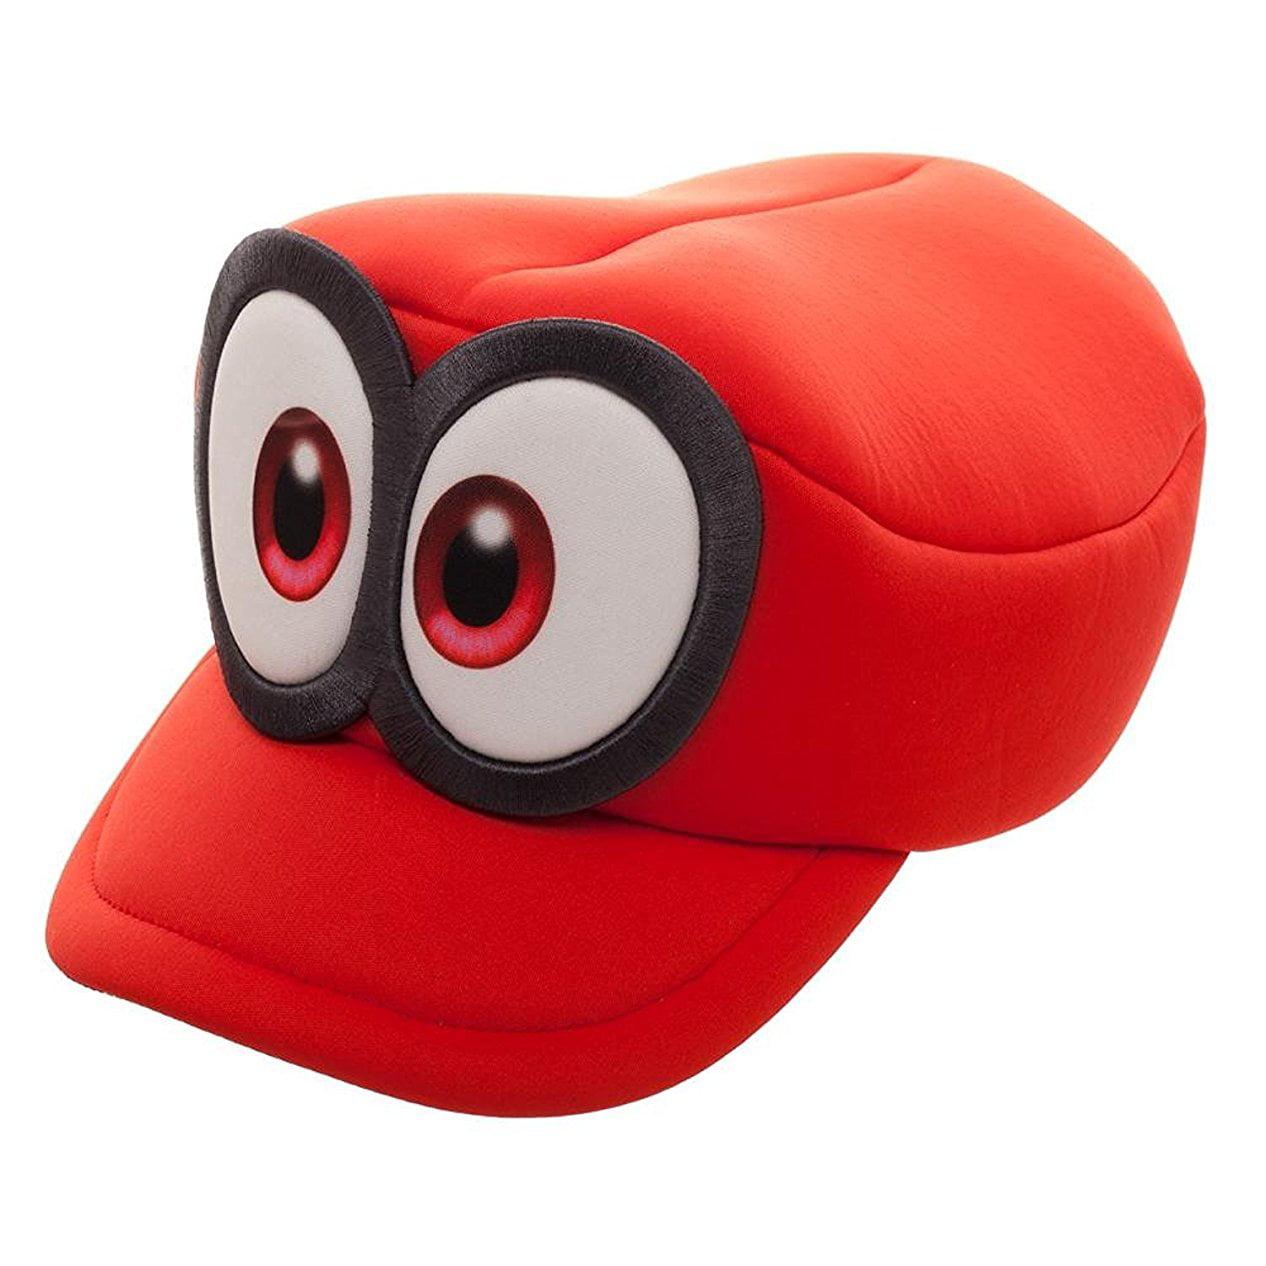 Super Mario Odyssey Cappy Hat Cosplay Accessory